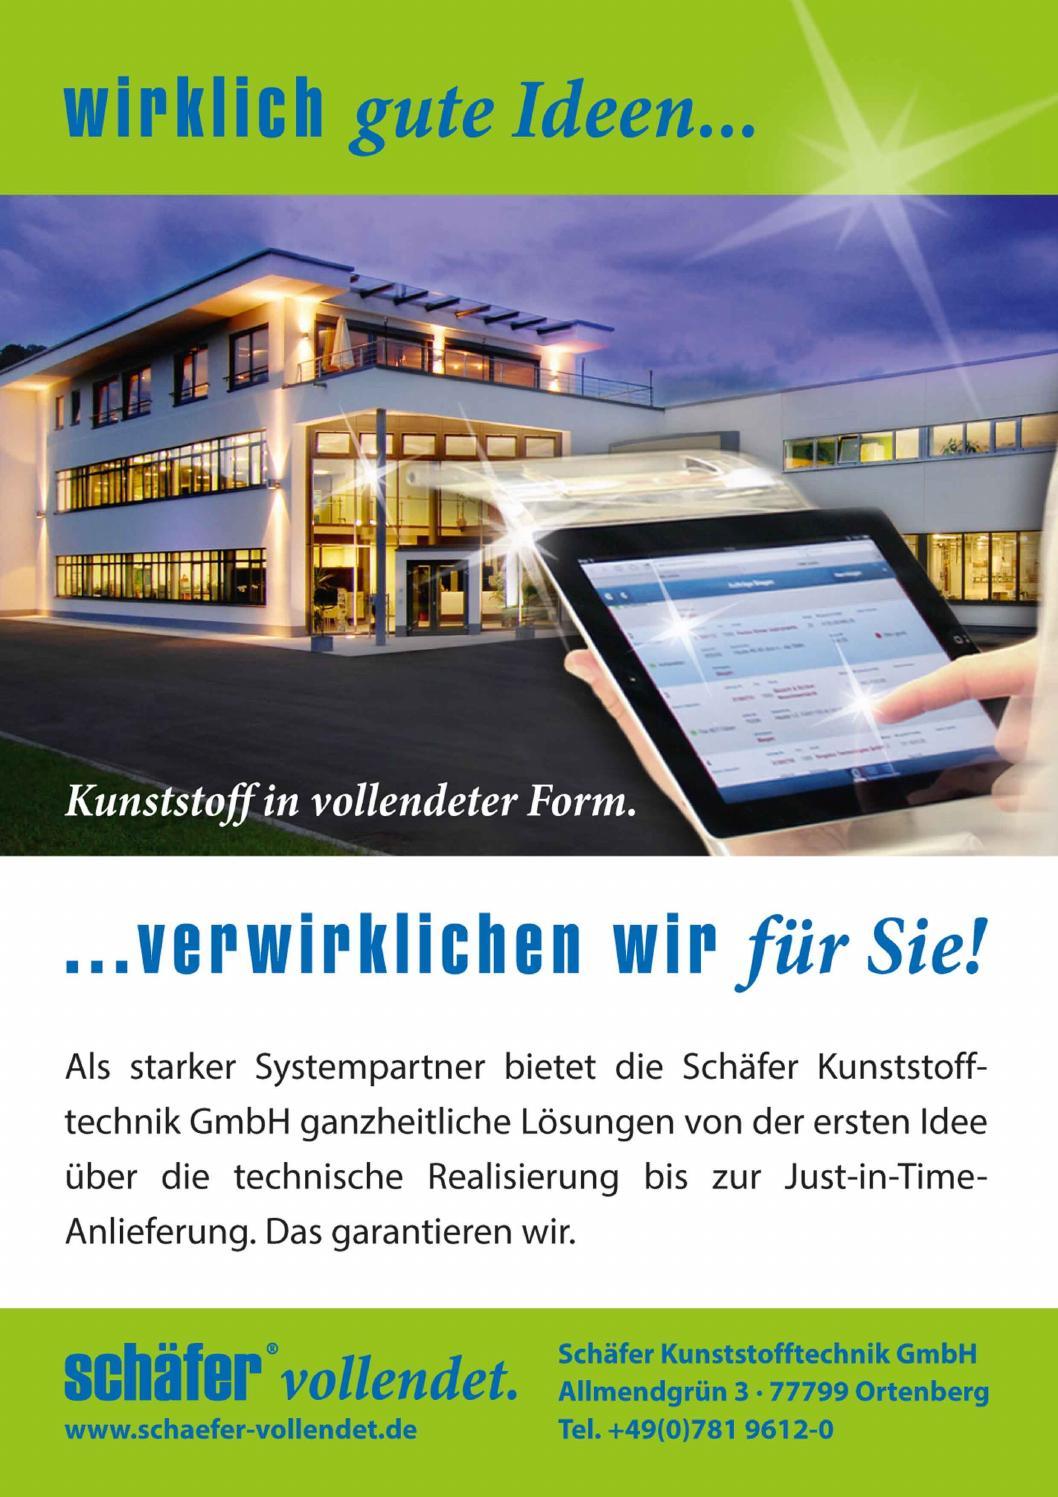 fbc offenburg vs tv vaihingen enz by stefan konprecht issuu. Black Bedroom Furniture Sets. Home Design Ideas